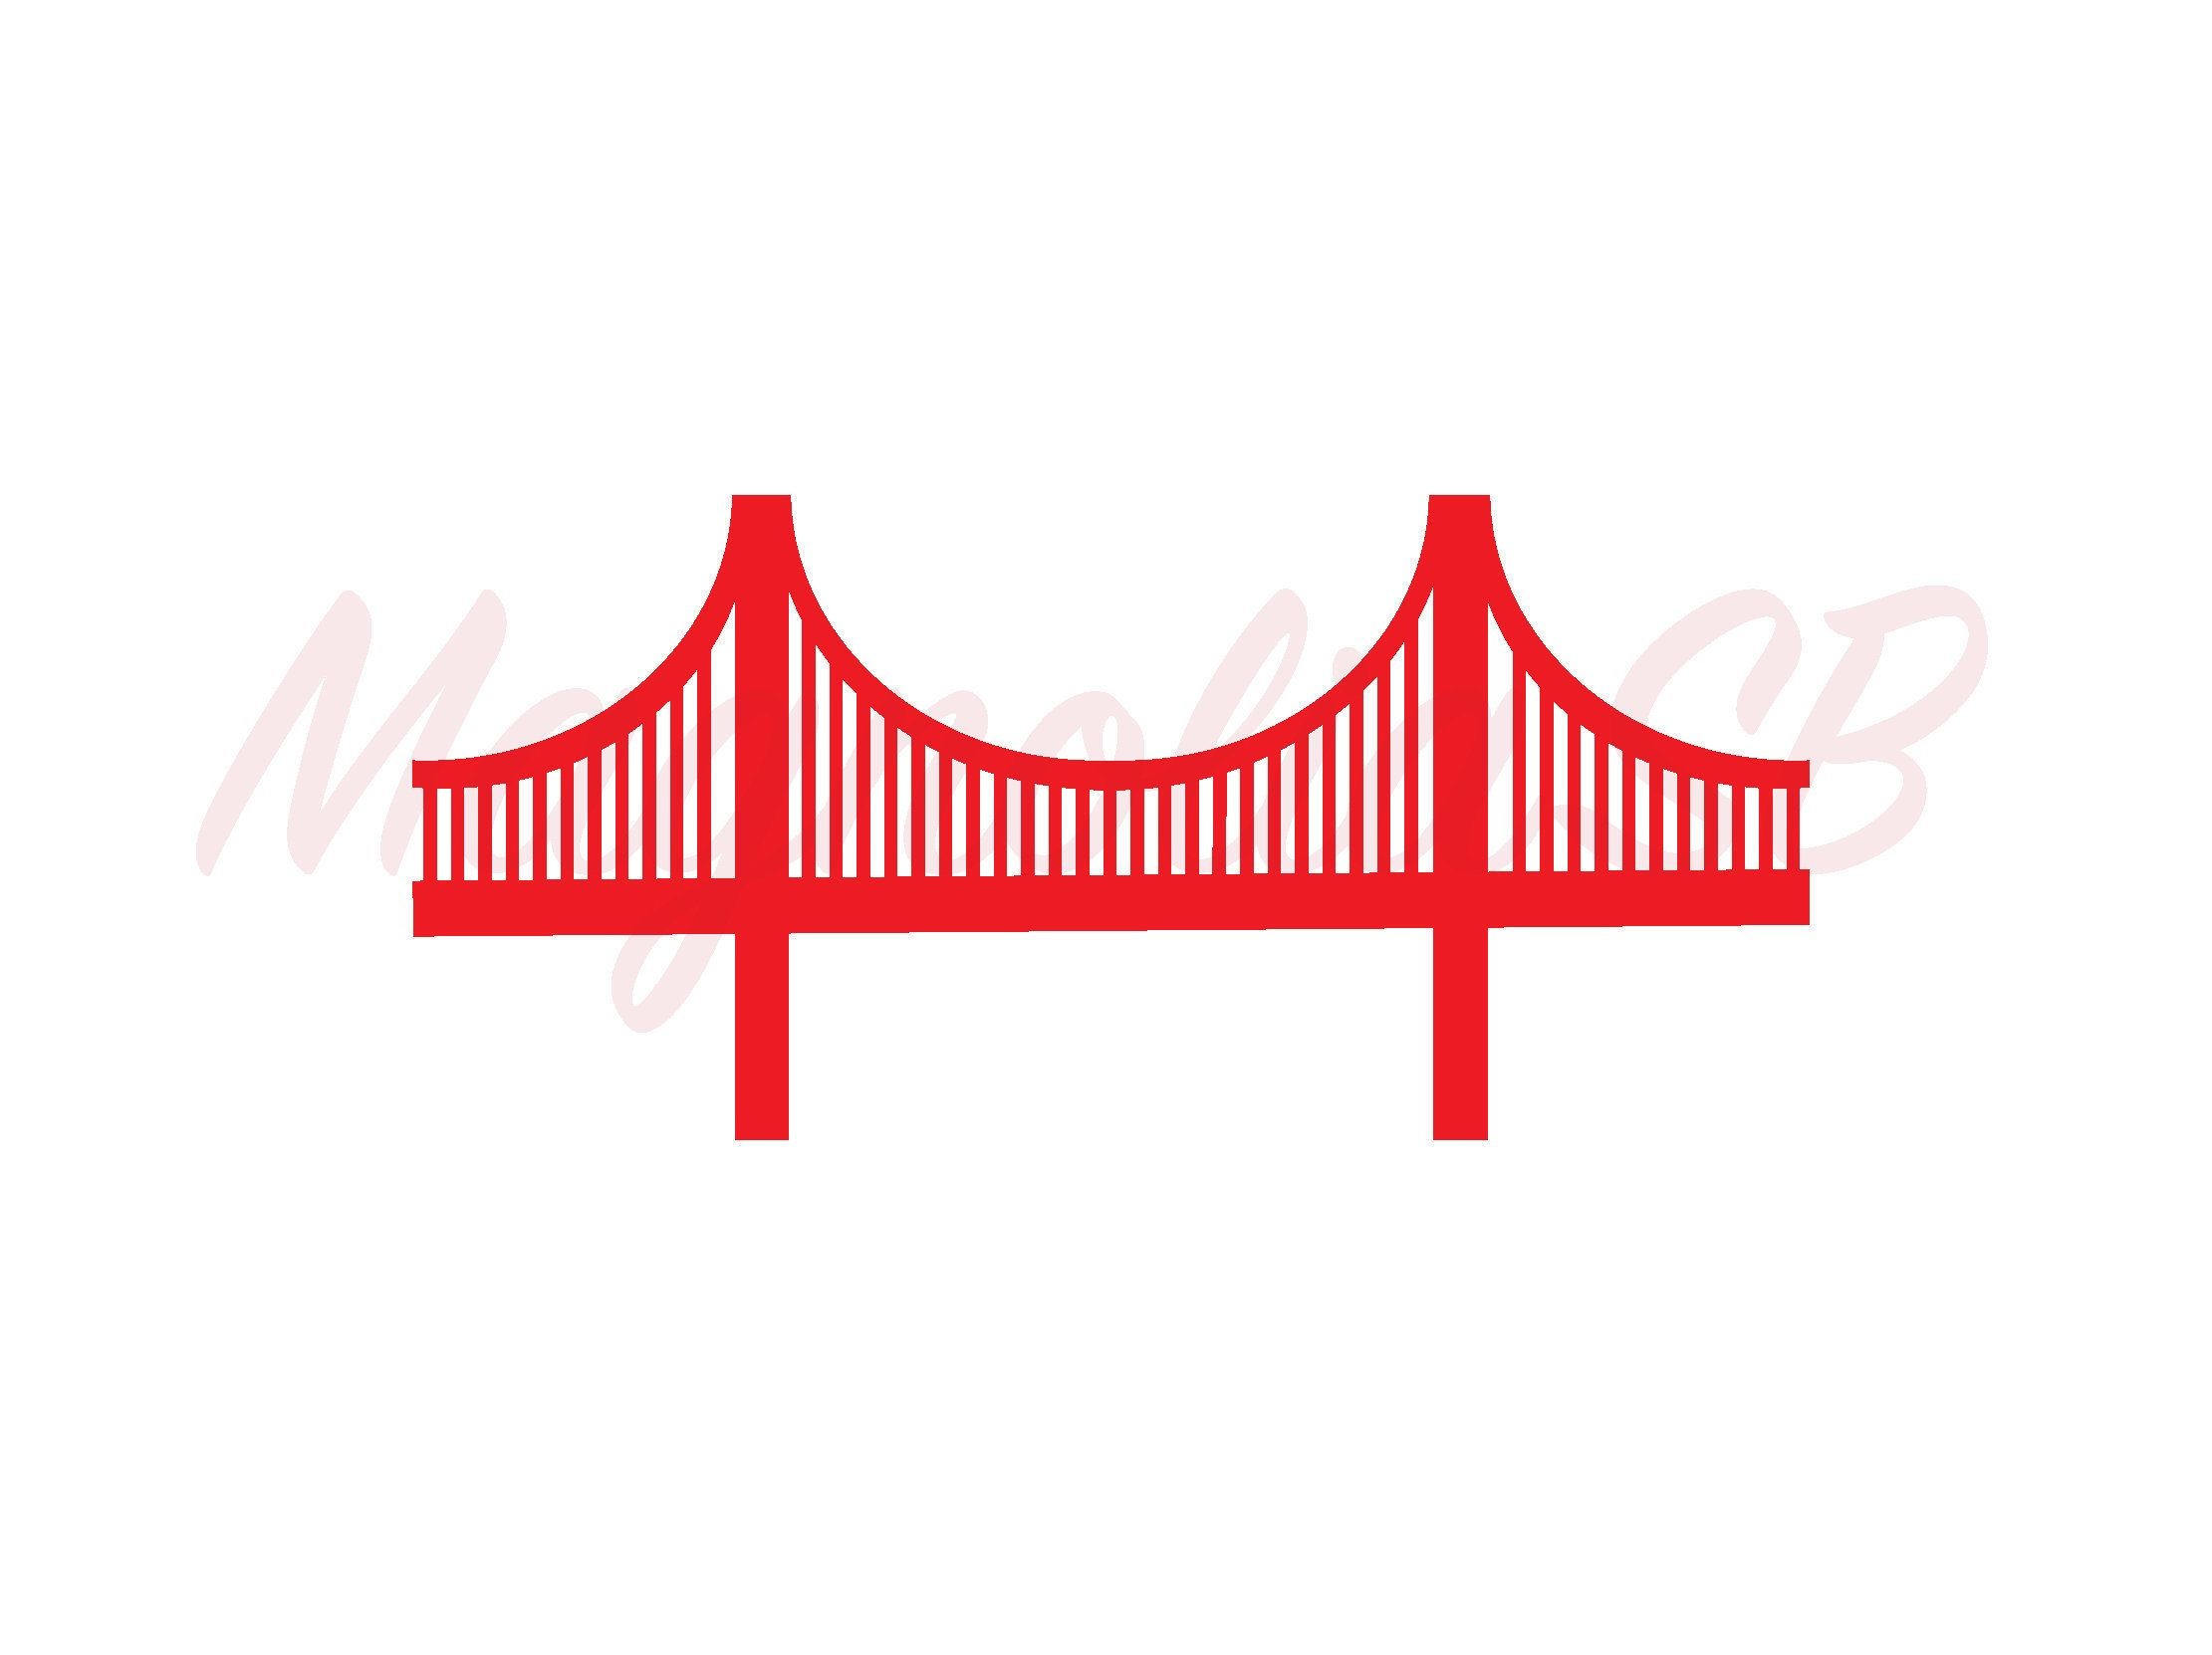 golden gate bridge svg golden gate bridge dxf golden gate bridge clipart [ 2221 x 1662 Pixel ]